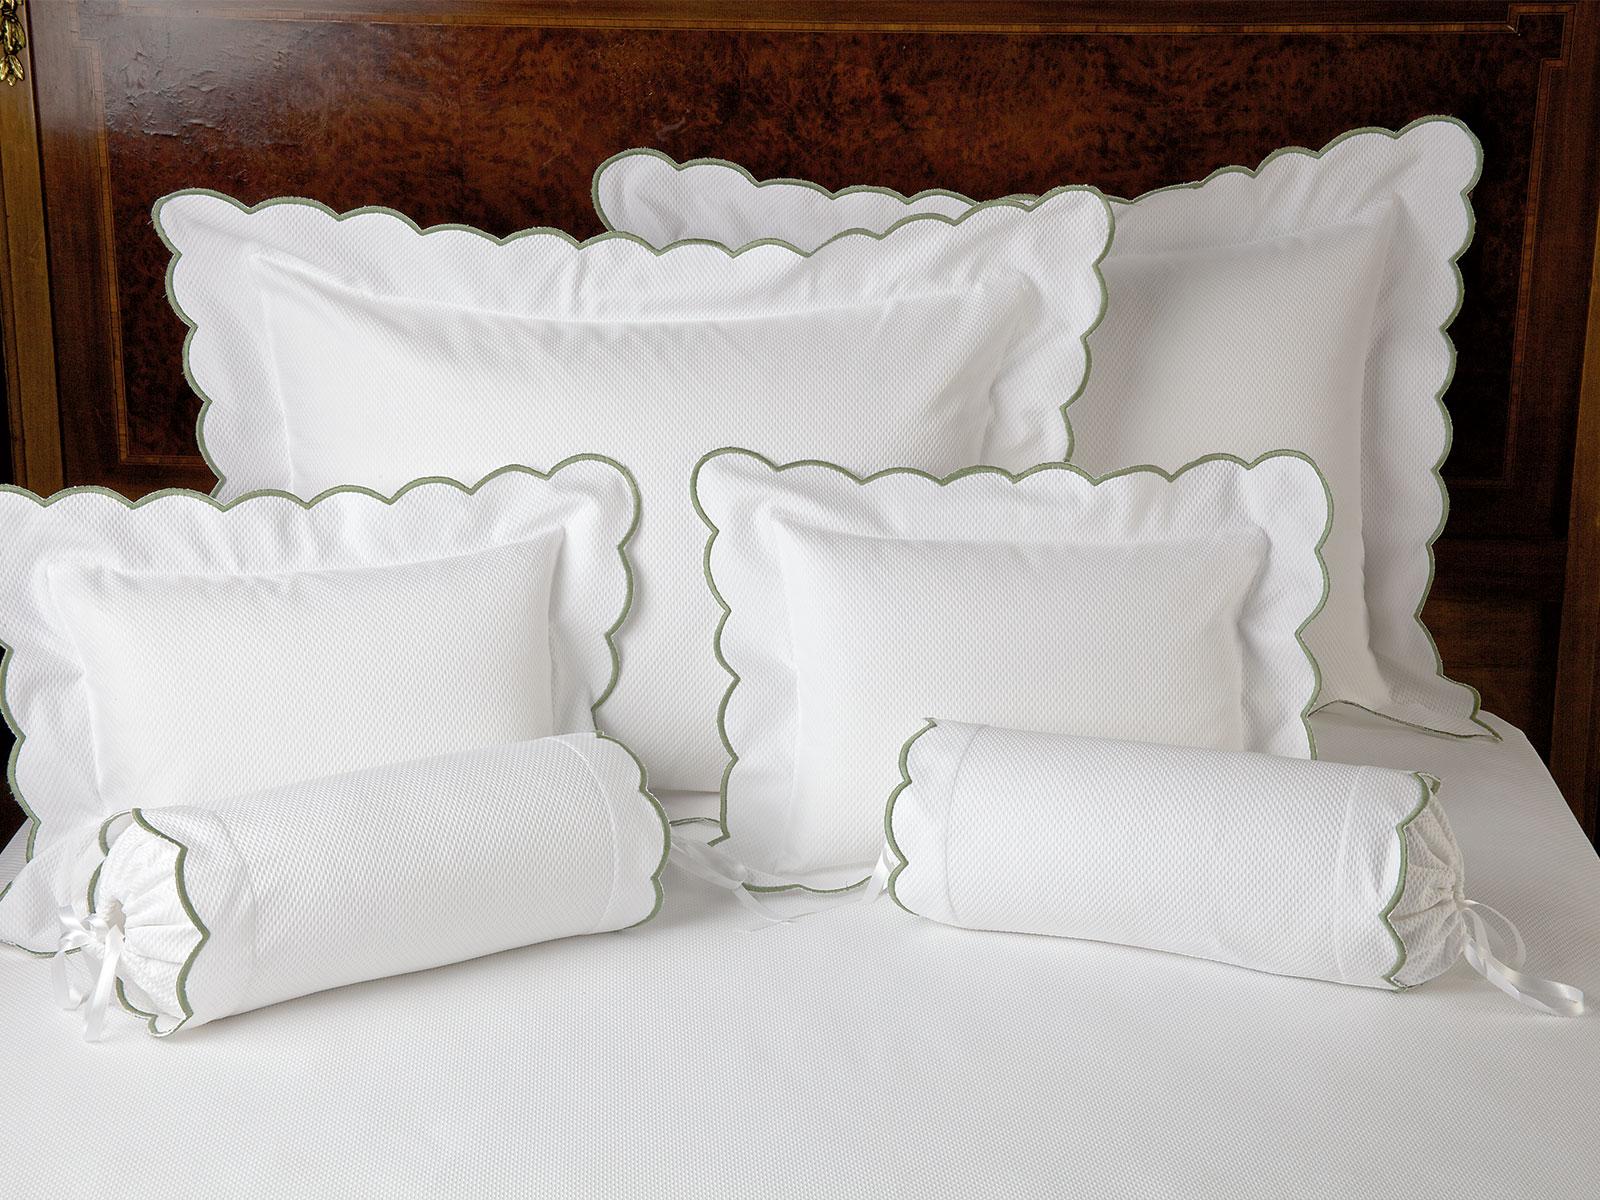 La Scala Luxury Bedding Italian Bed Linens